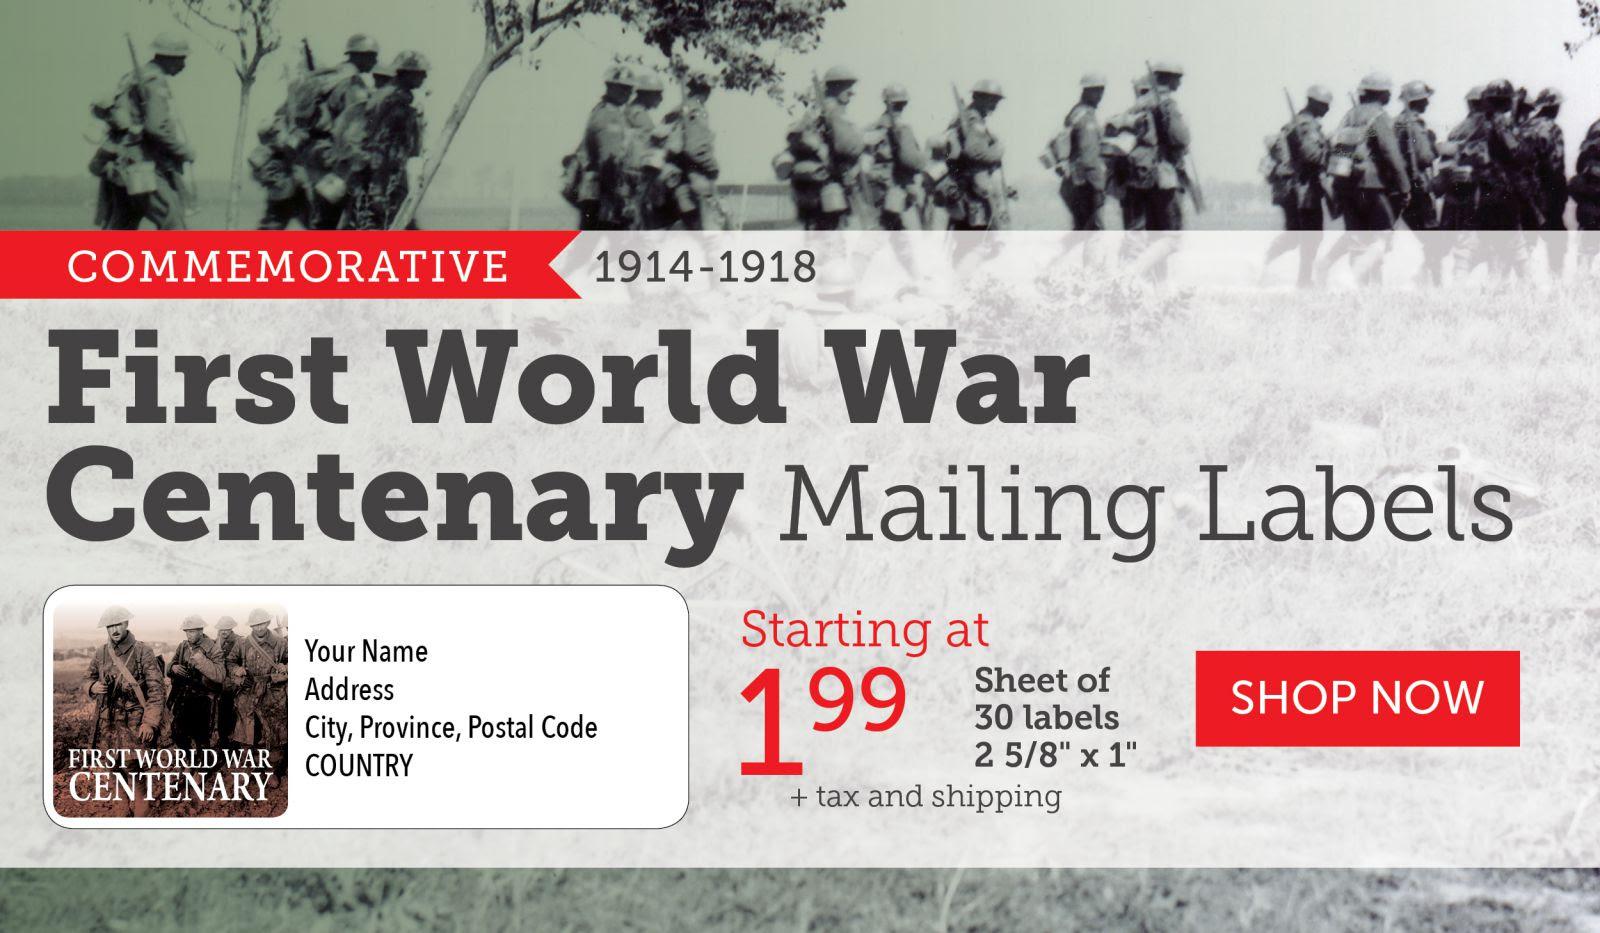 First World War Centenary Mailing Labels Version 3